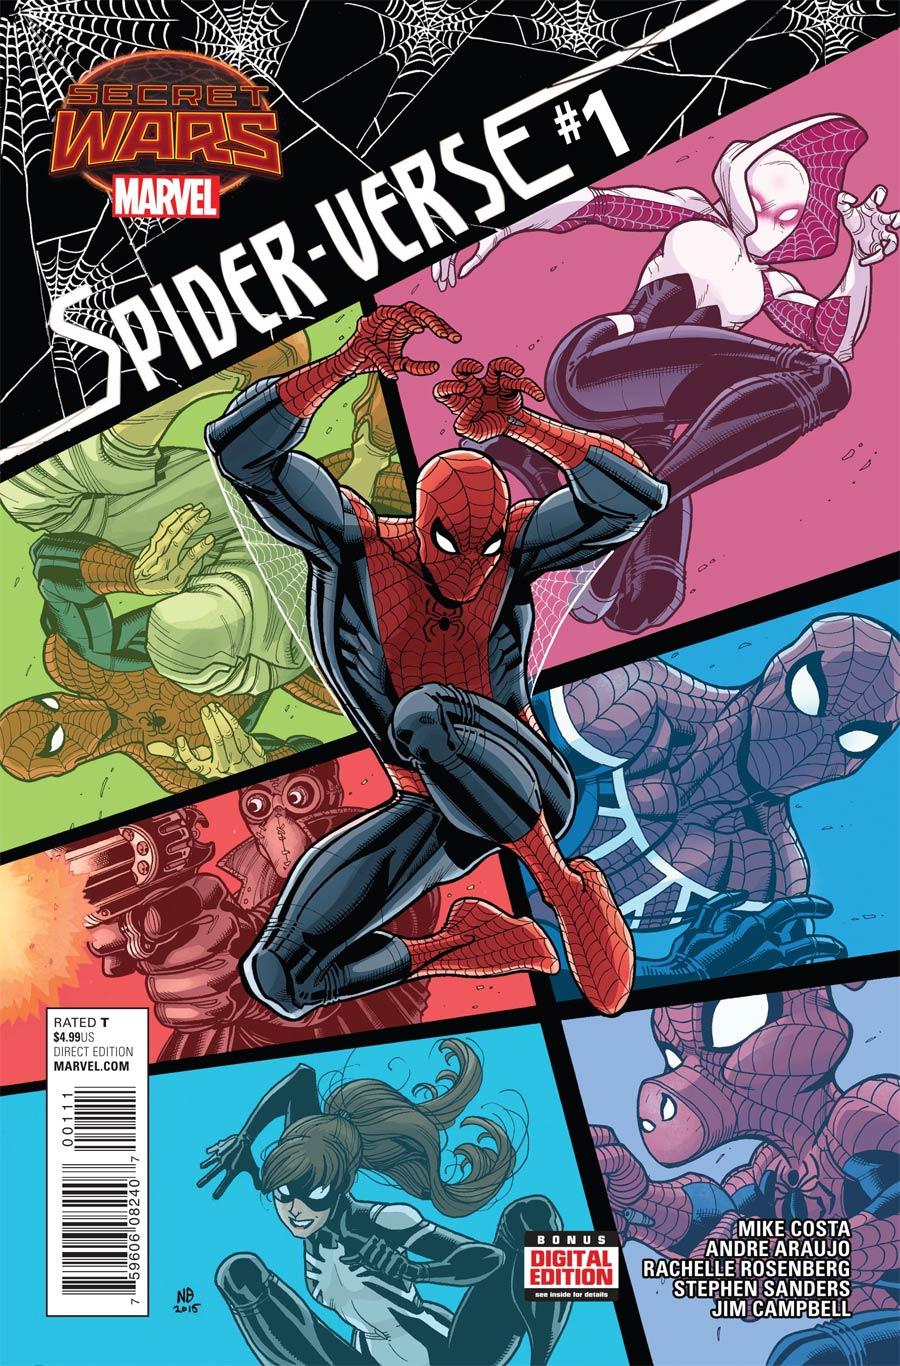 Spider-Verse Vol 2 #1 Cover A Regular Nick Bradshaw Cover (Secret Wars Warzones Tie-In)